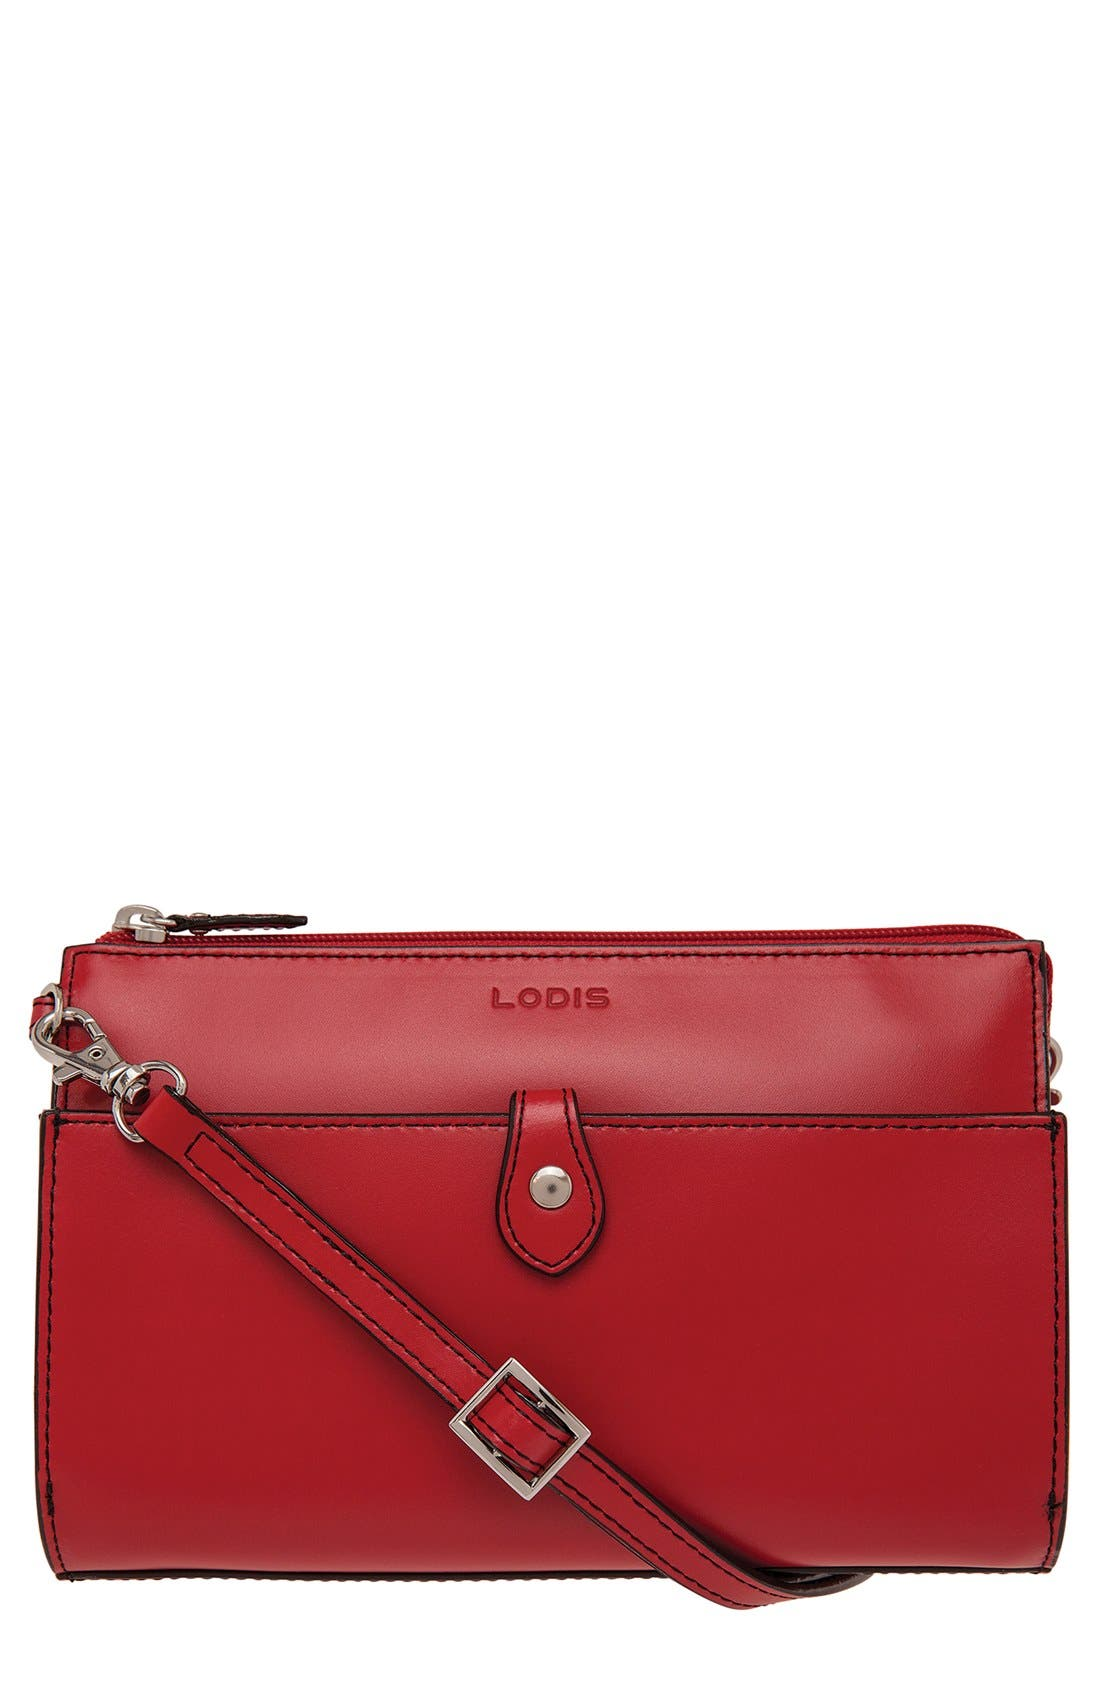 Lodis'Audrey Collection -Vicky' ConvertibleCrossbody Bag,                             Main thumbnail 7, color,